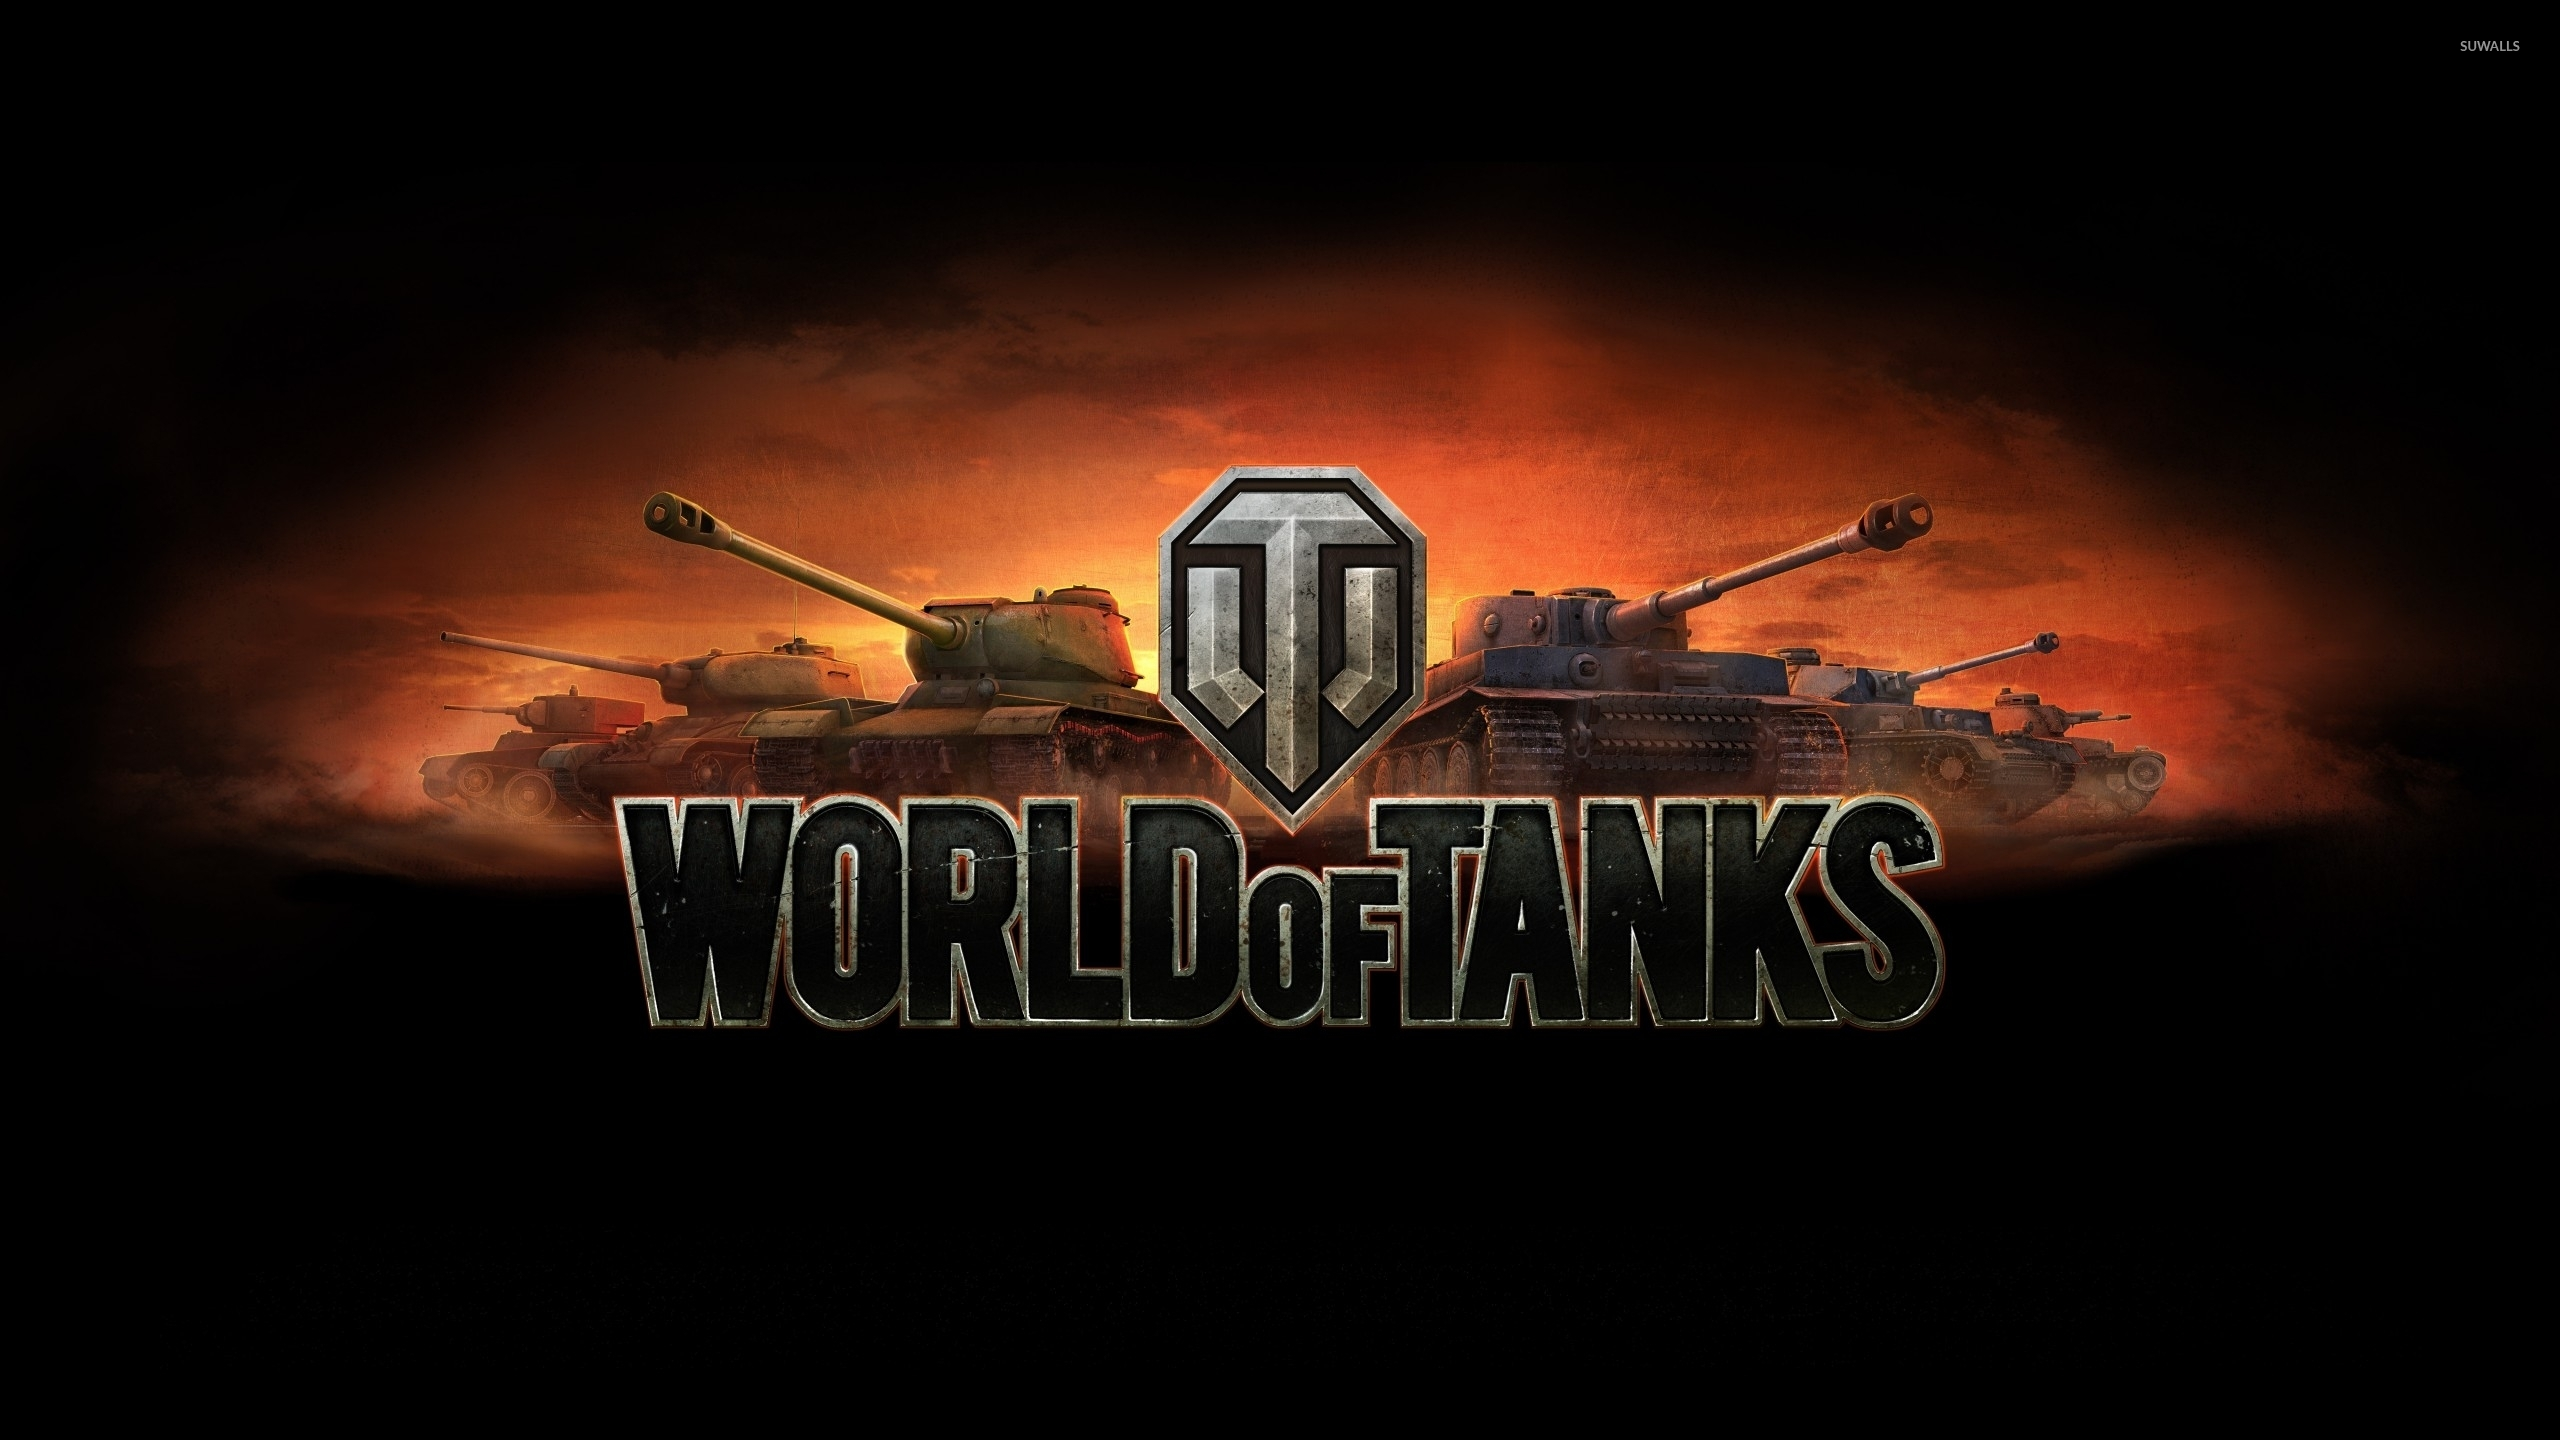 World Of Tanks Wallpaper Game Wallpapers 26337